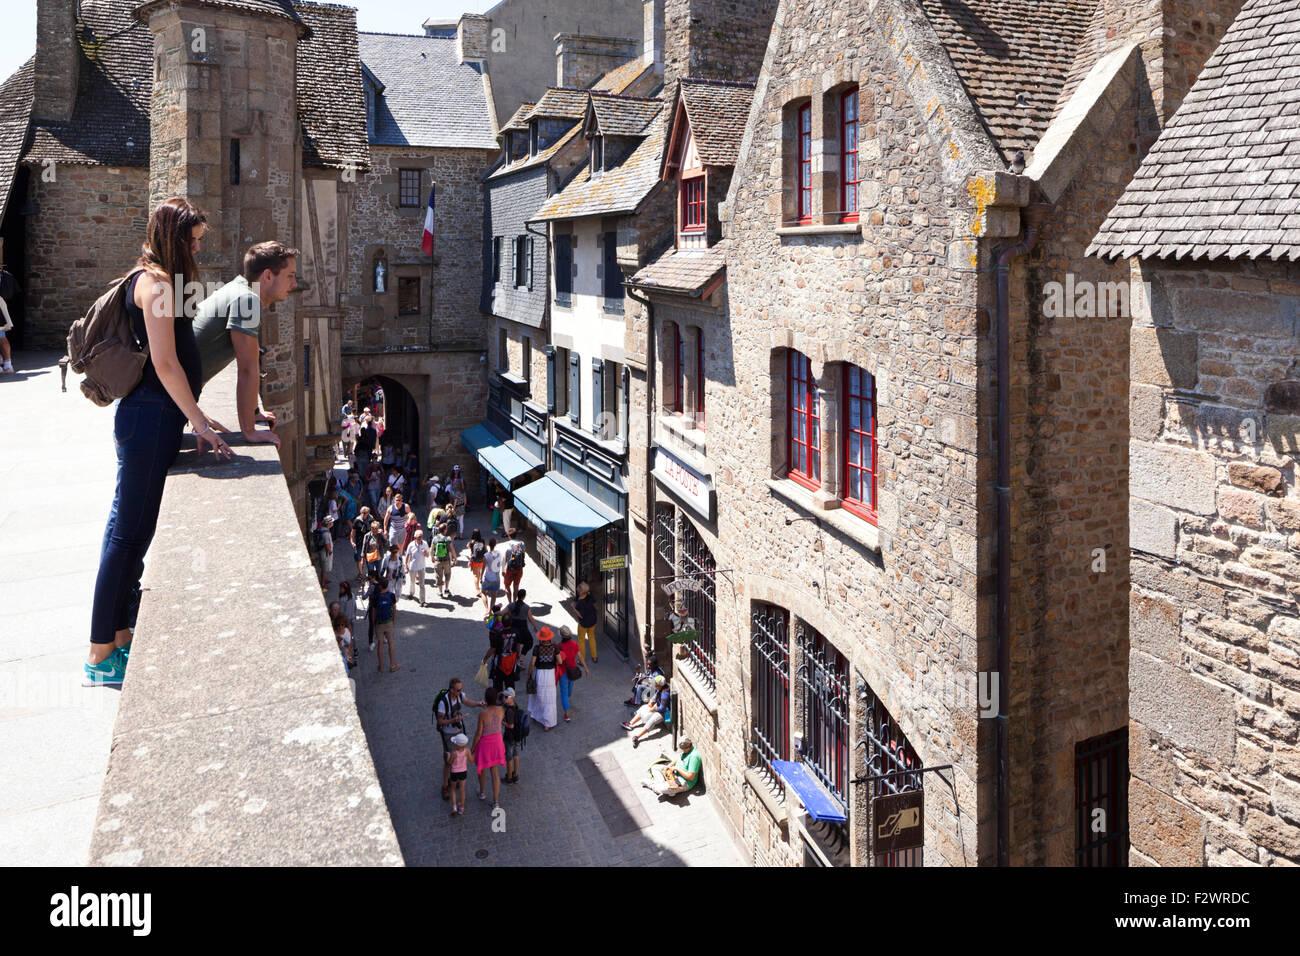 Old buildings in Grande Rue, Mont Saint Michel, Normandy, France - Mont St Michel - Stock Image